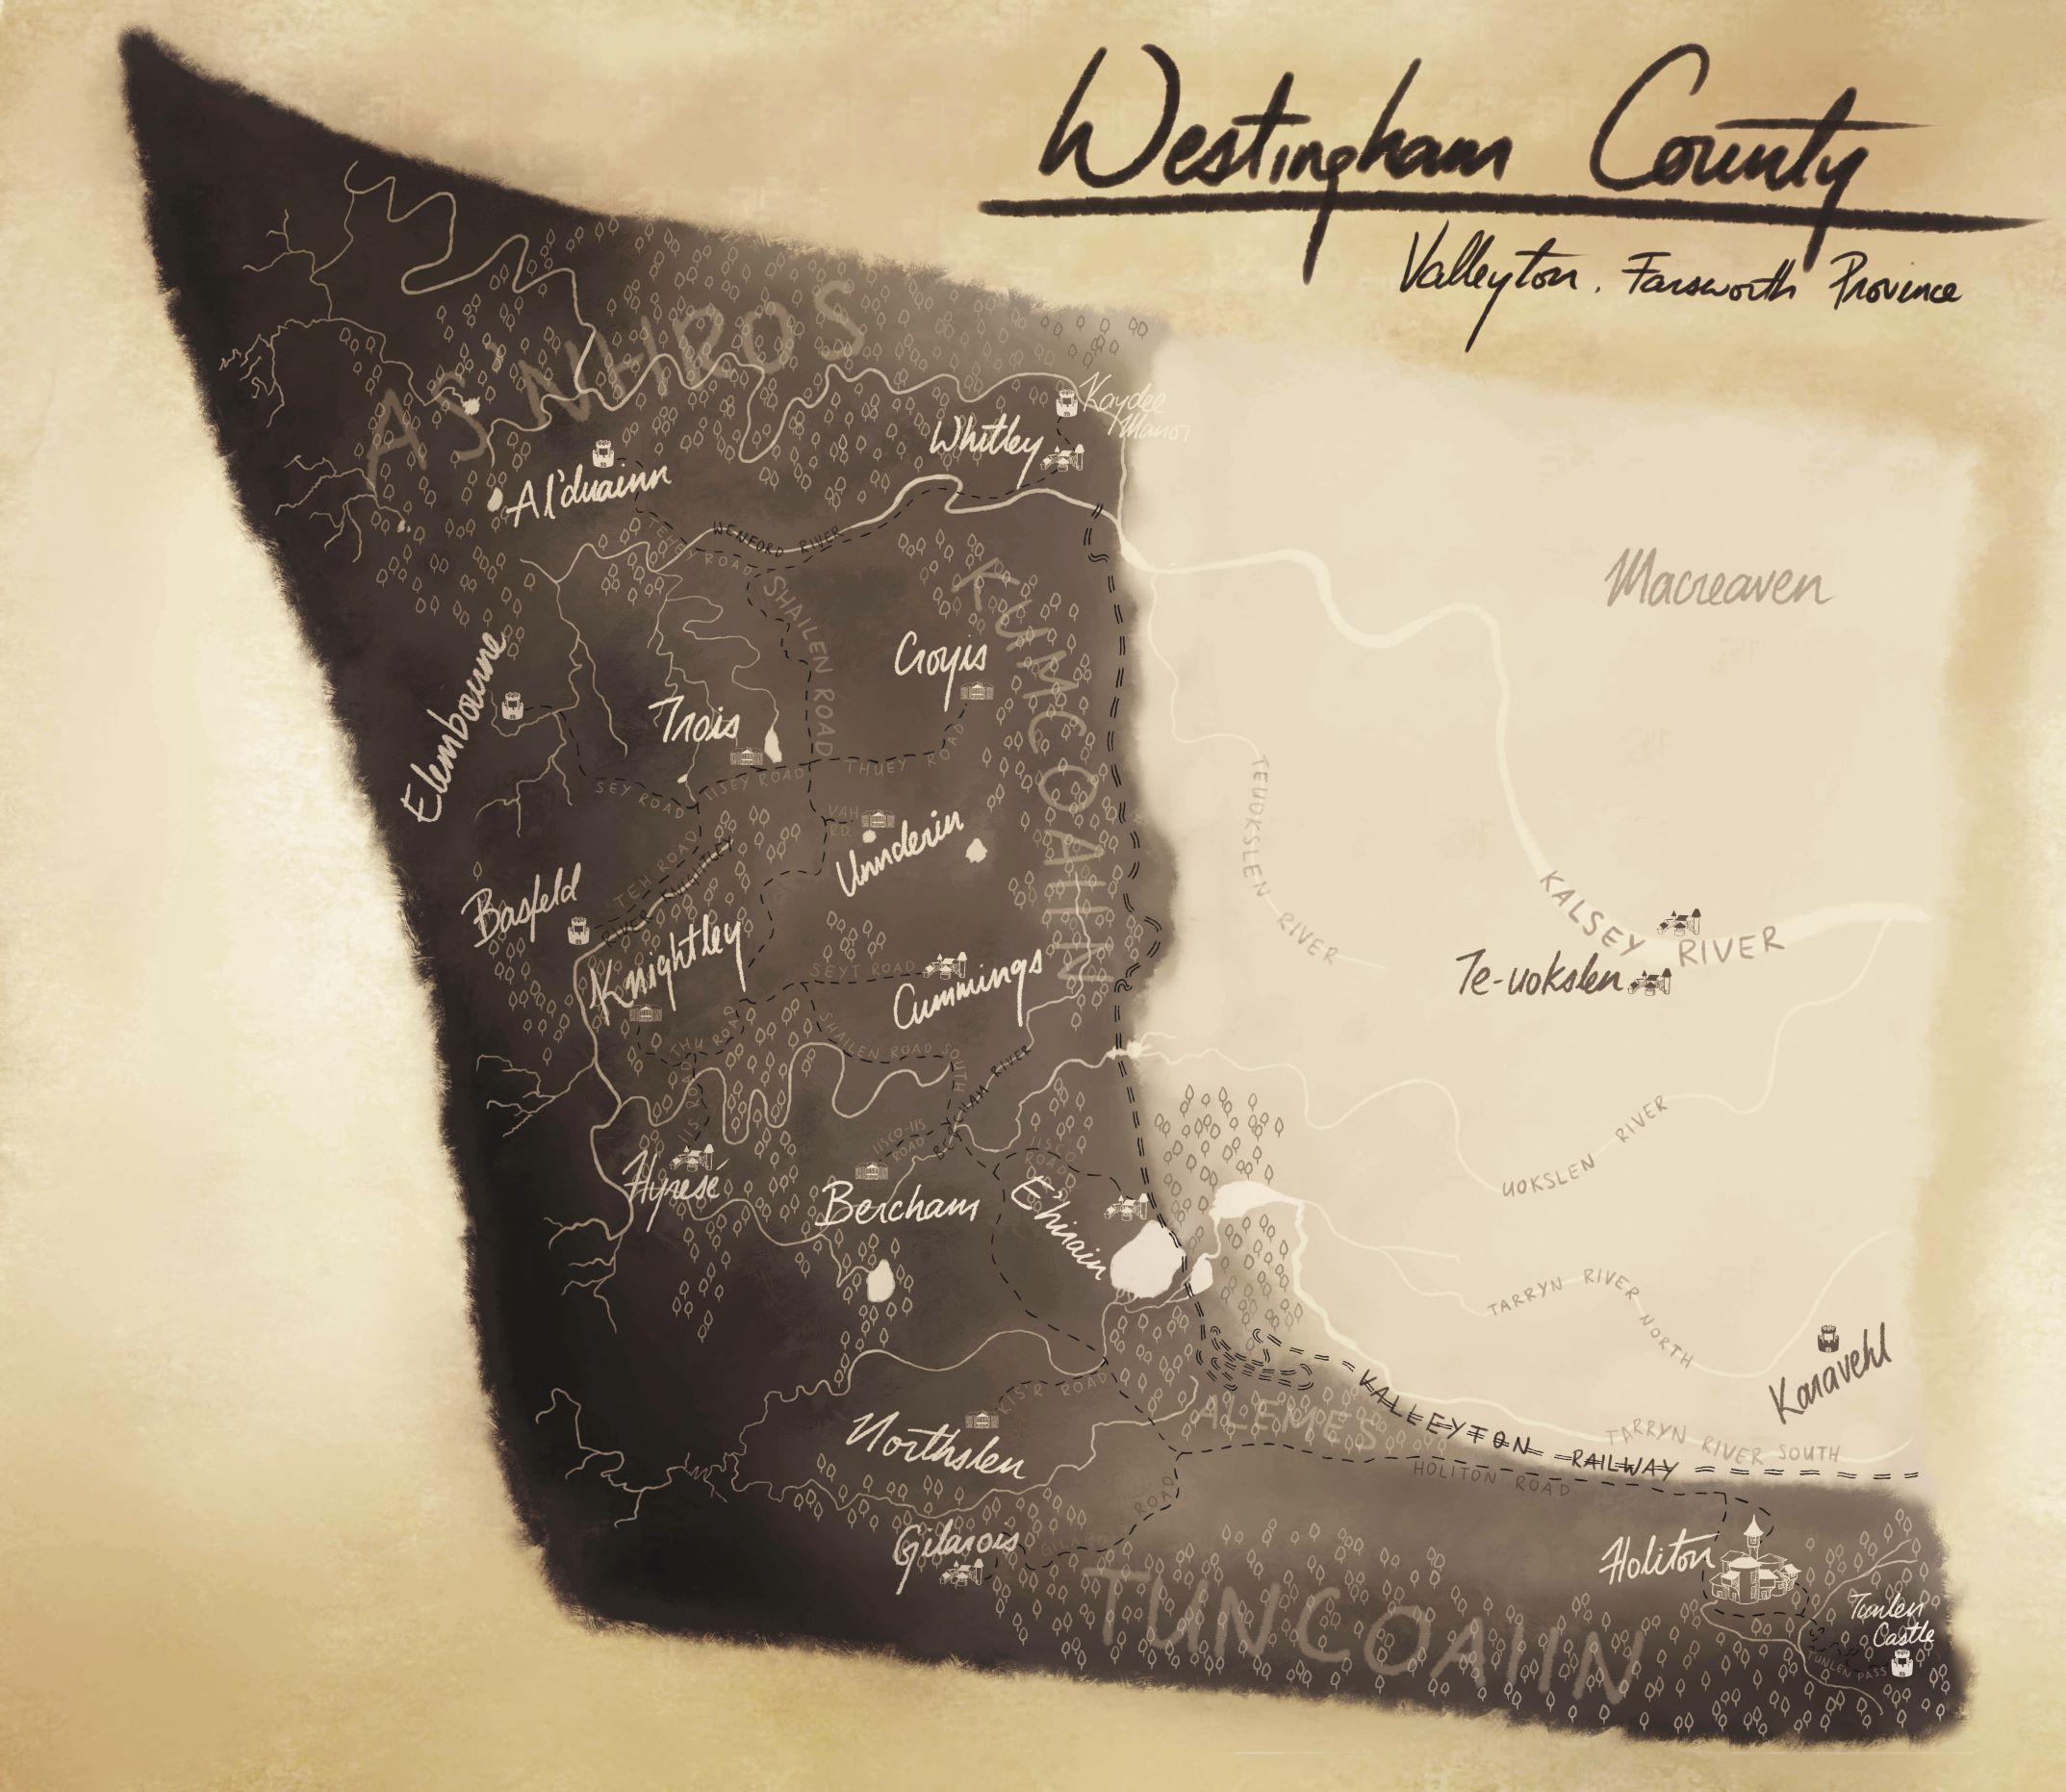 Westingham County, est 8600